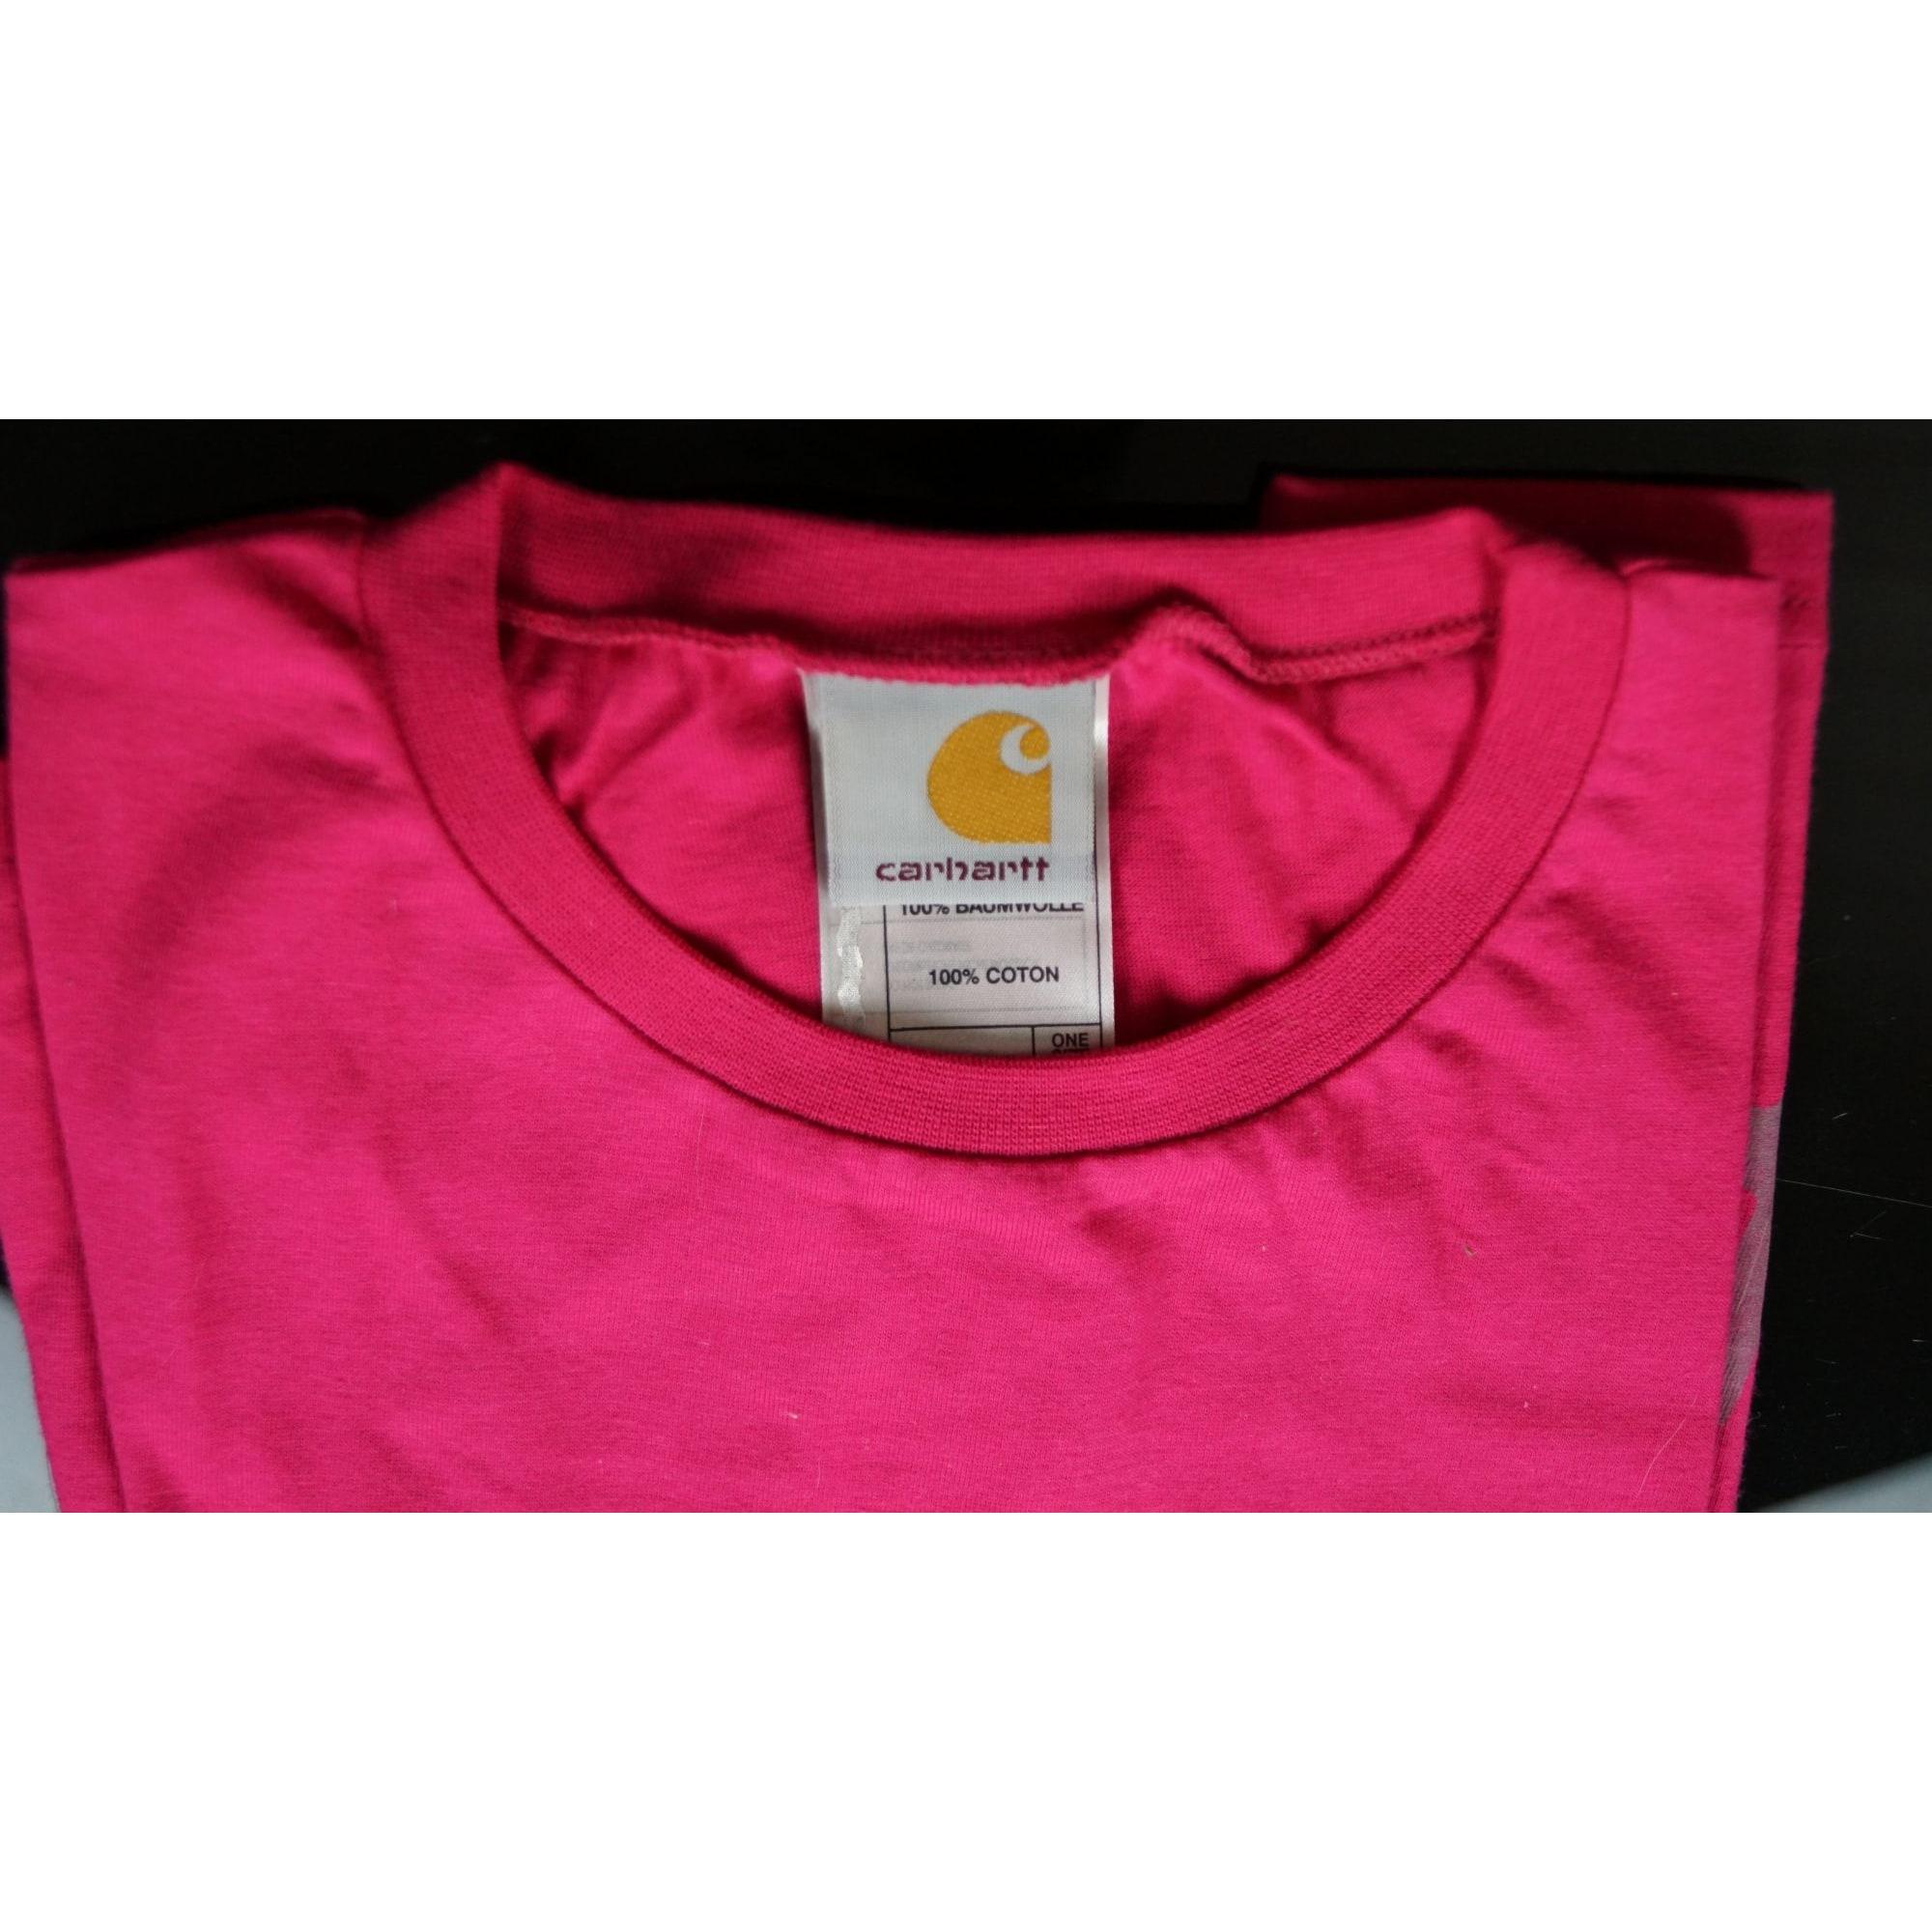 Tee-shirt CARHARTT Rose, fuschia, vieux rose